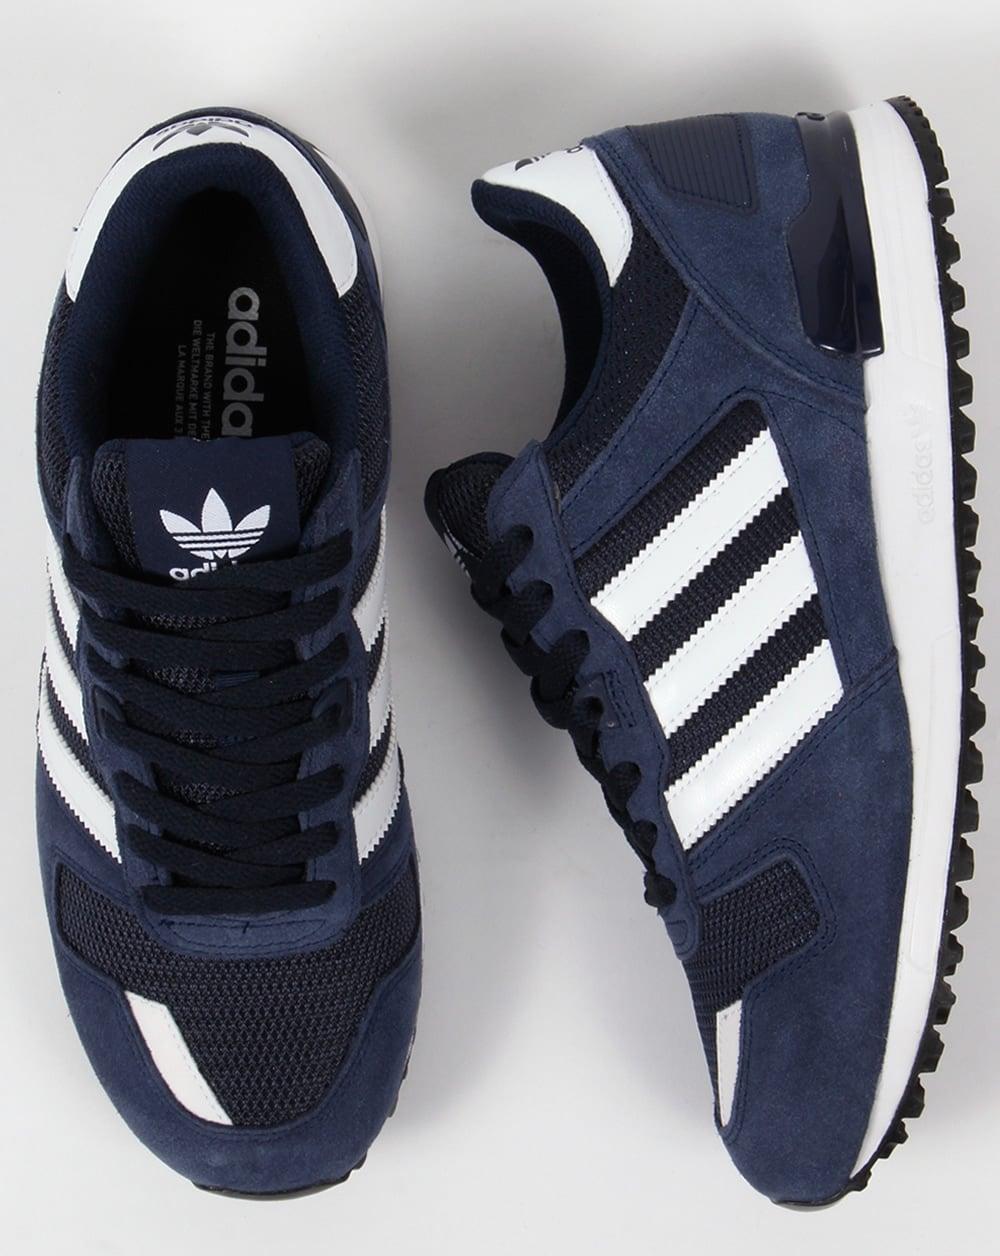 best website 07b48 c50a6 Adidas ZX 700 Trainers Navy/White